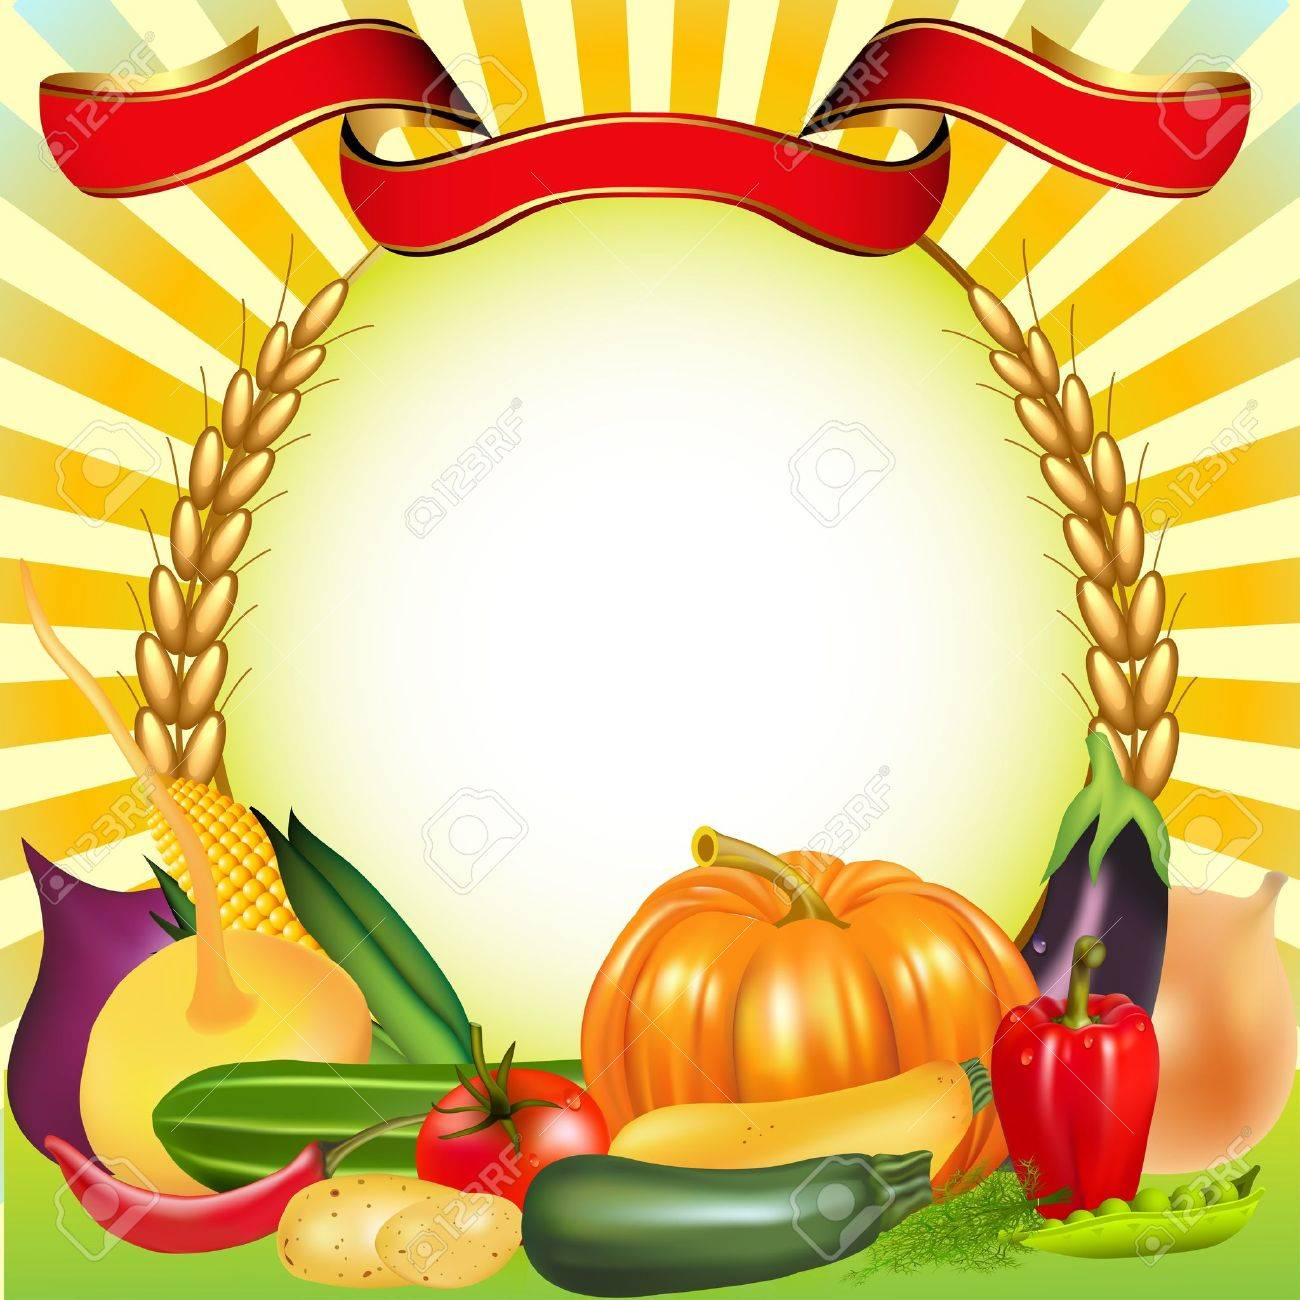 illustration background harvest vegetables ear pumpkin cucumber tomato Stock Vector - 15314402